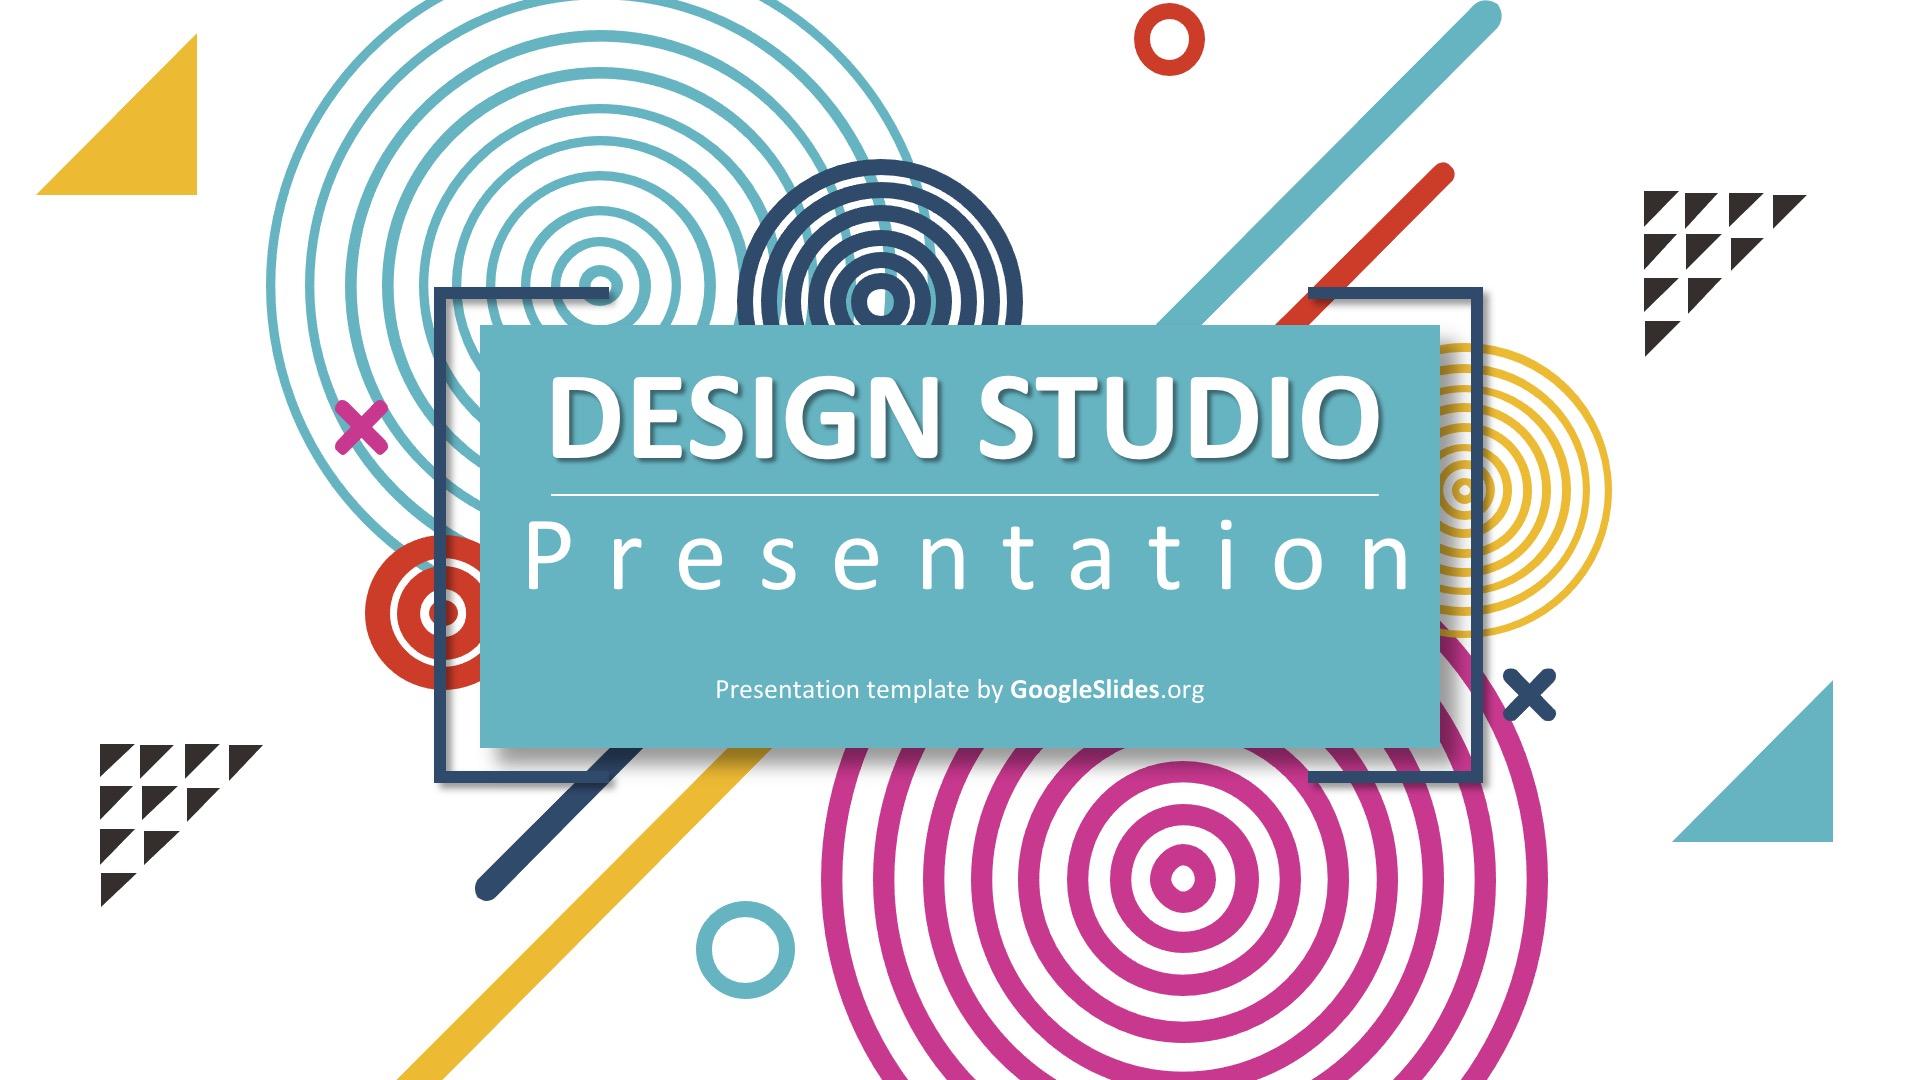 Design Studio Presentation